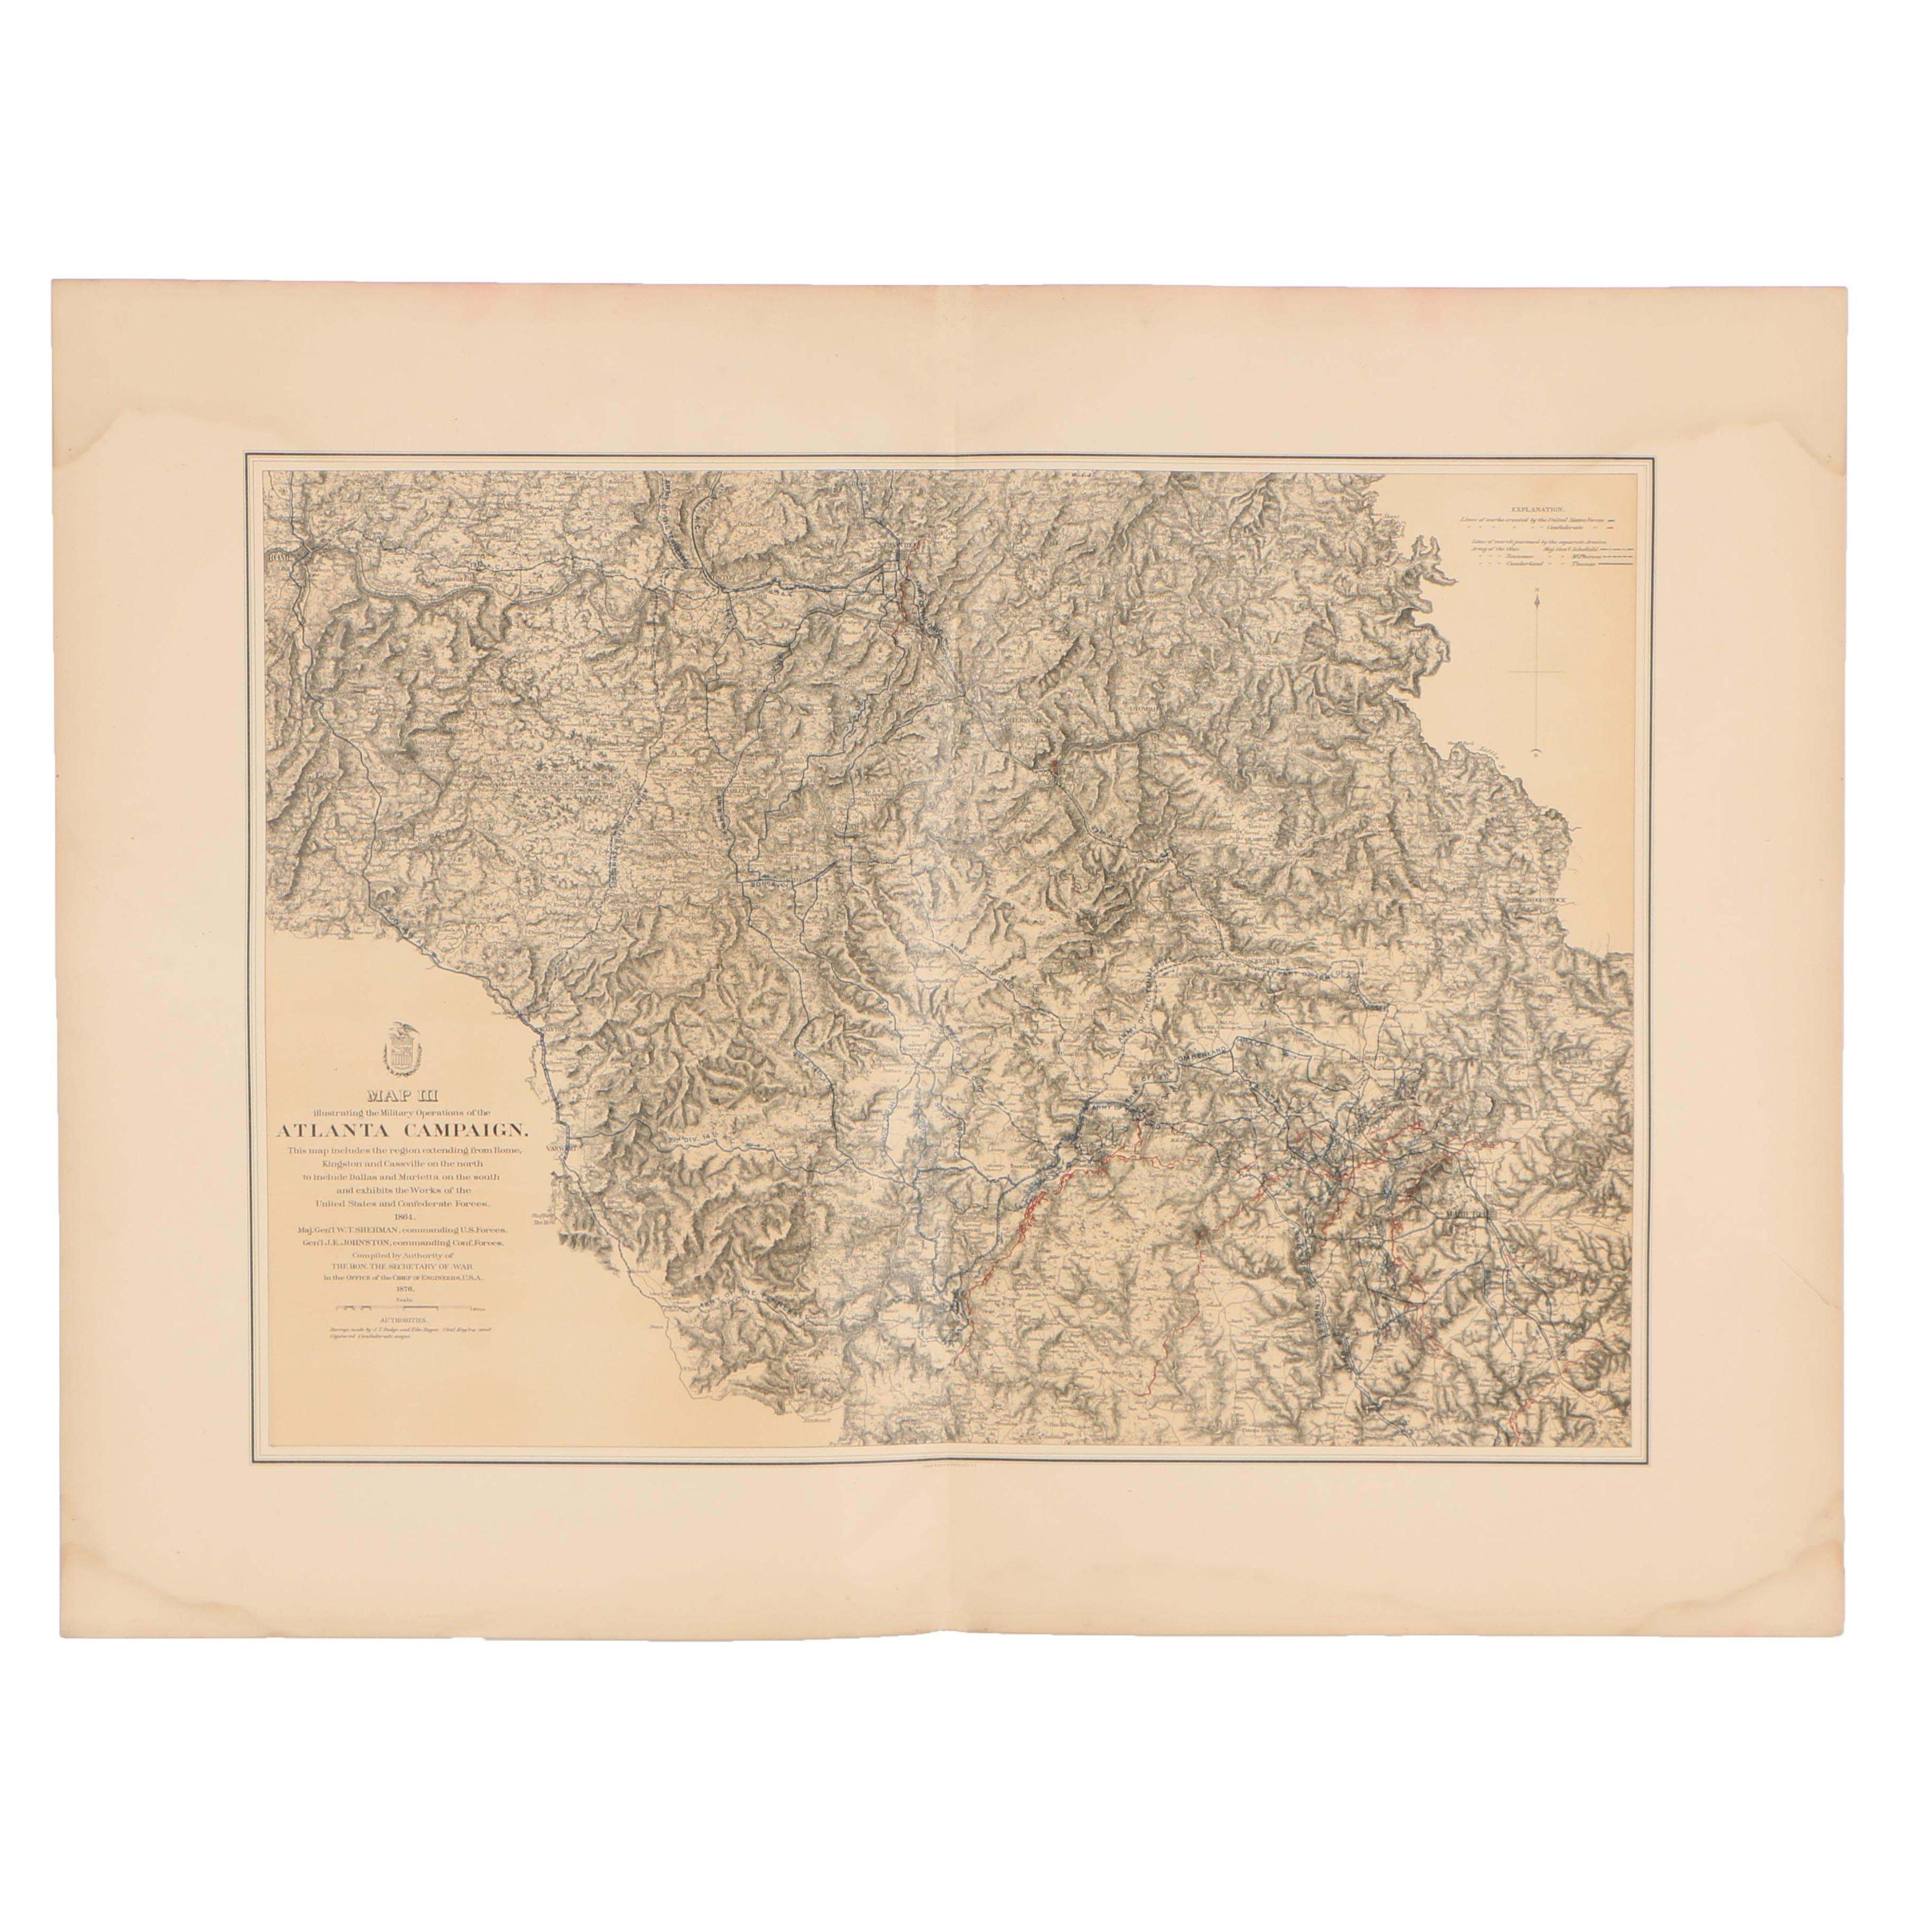 Late 19th Century United States Civil War Battlefield Map